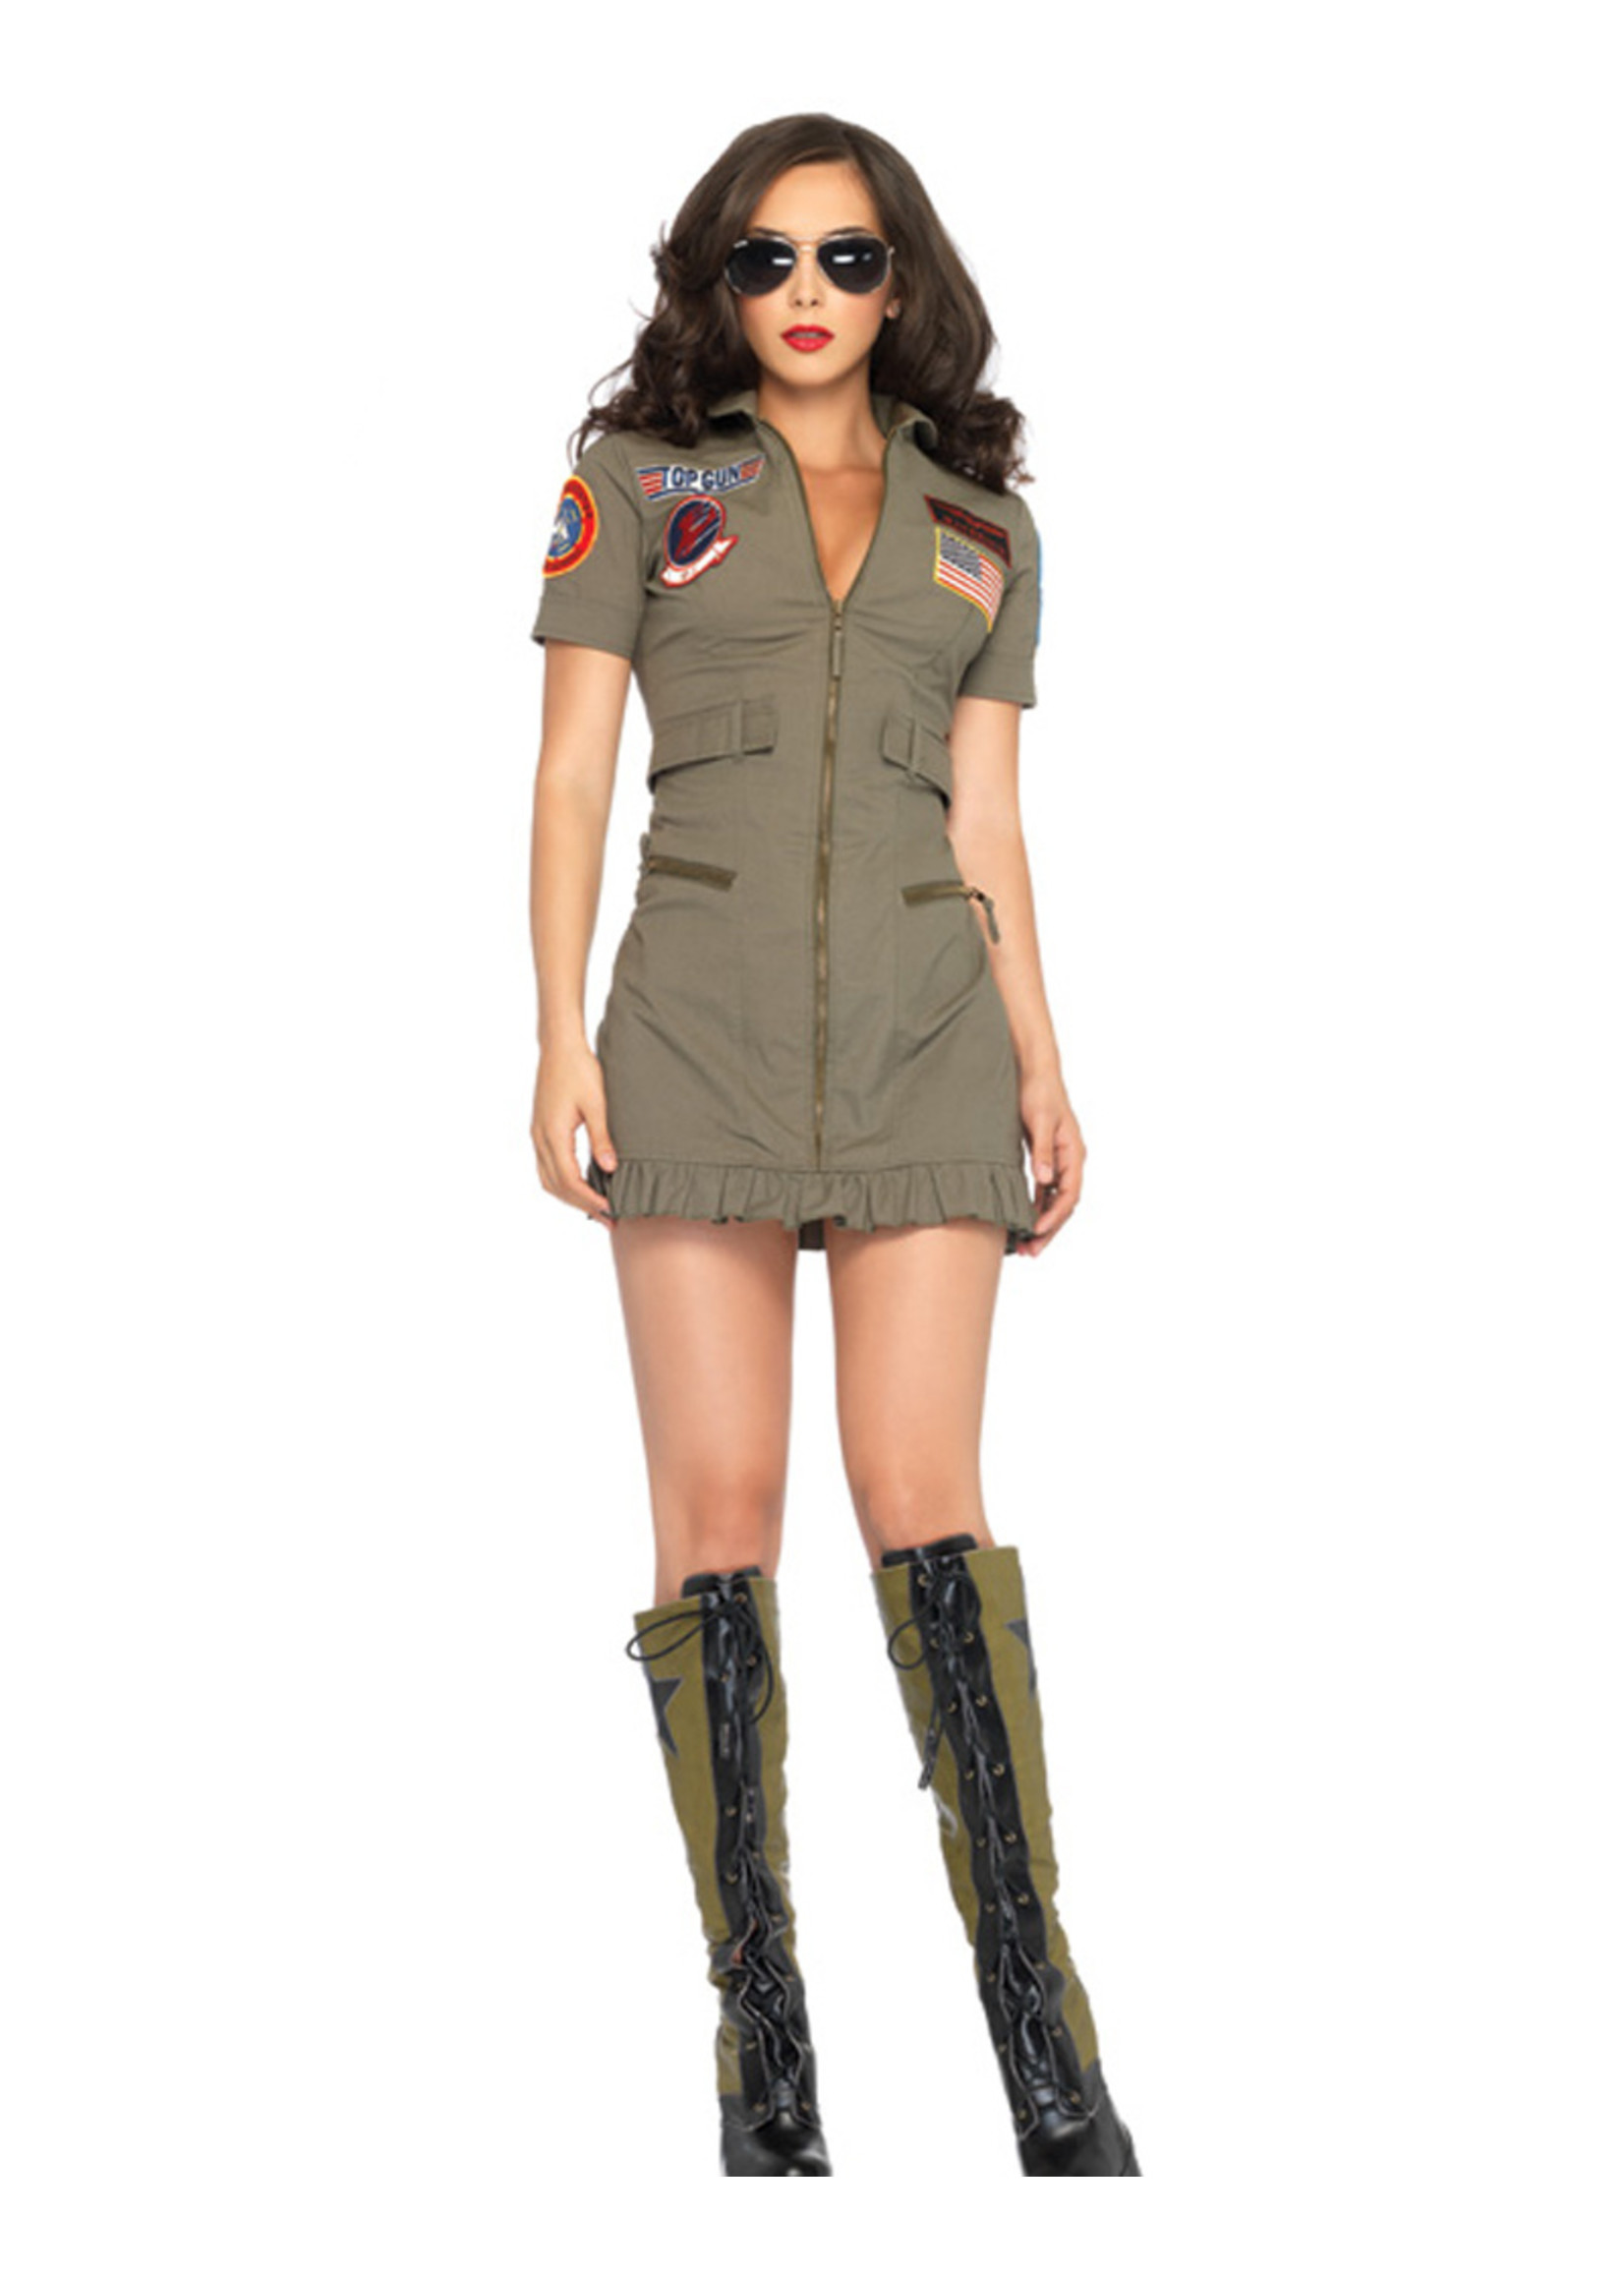 Top Gun Woman Costume - Women's